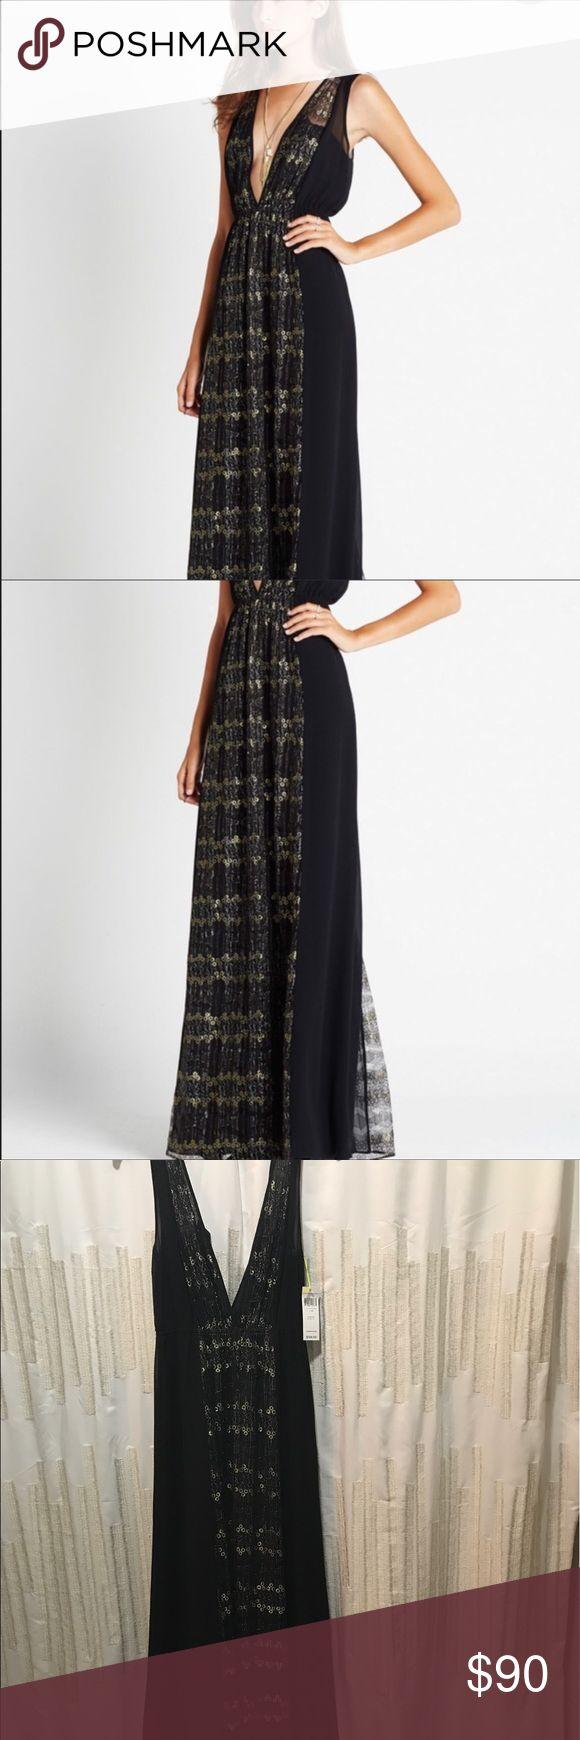 Black and gold chevron maxi dress